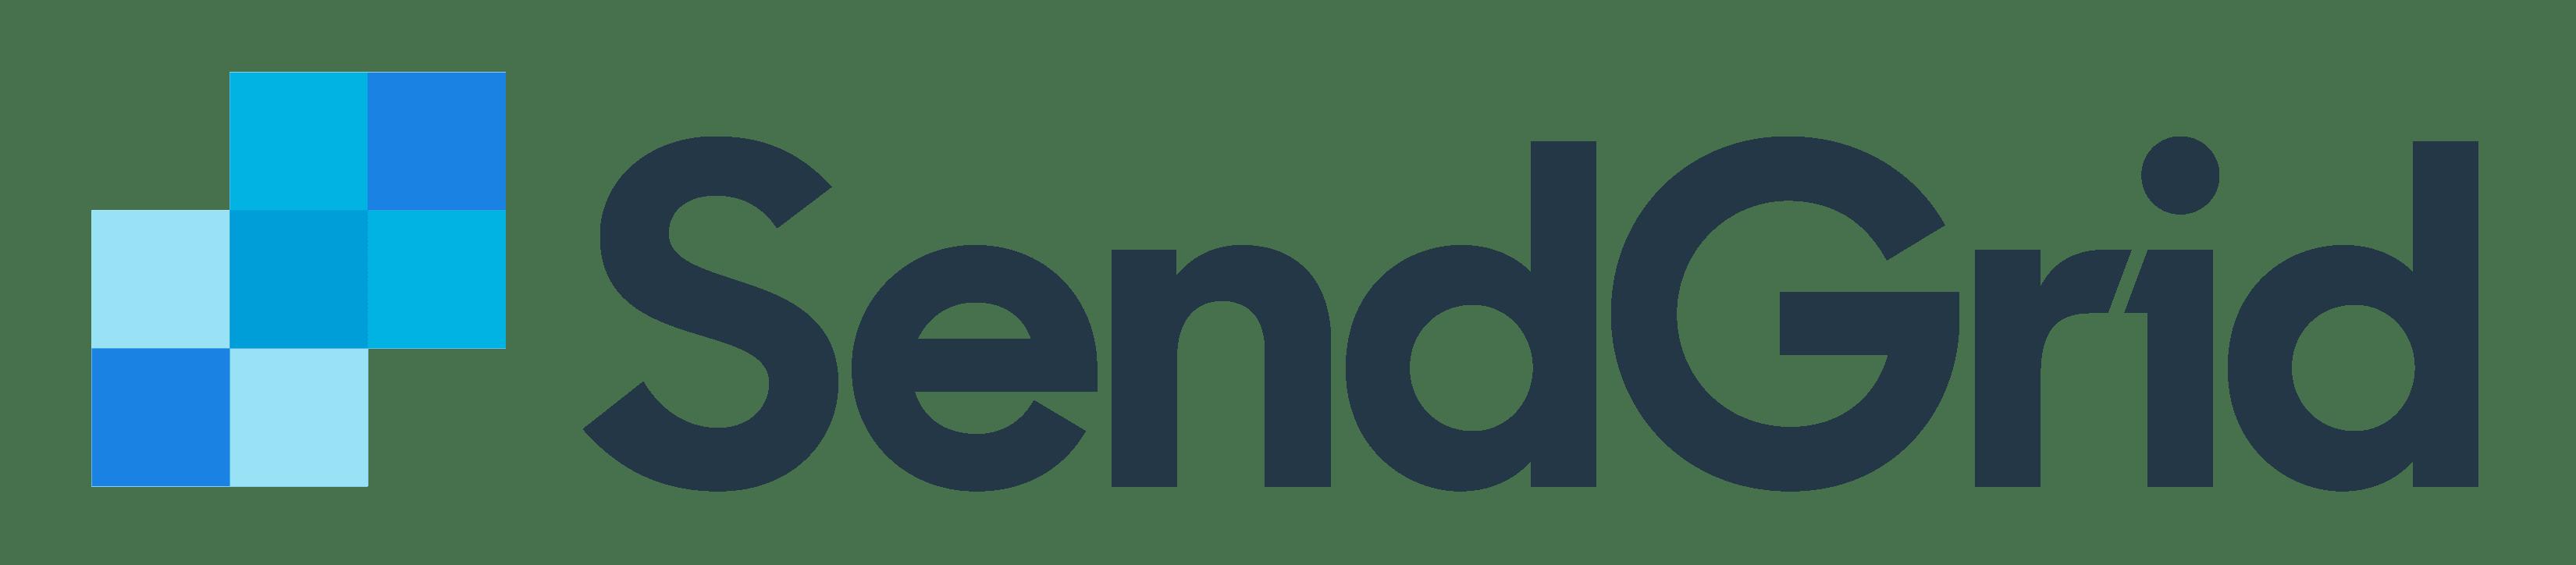 Twilio Sendgrid Coupon & Startup Discount